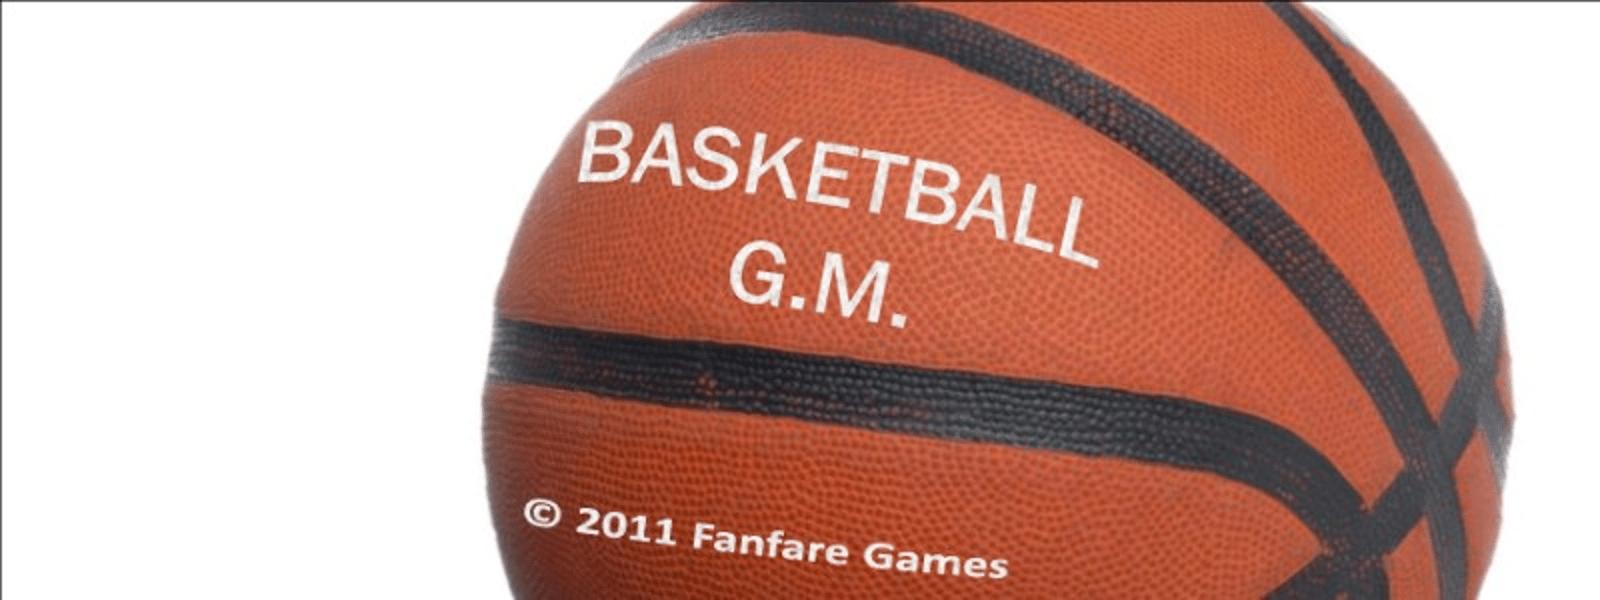 basketball g m intro